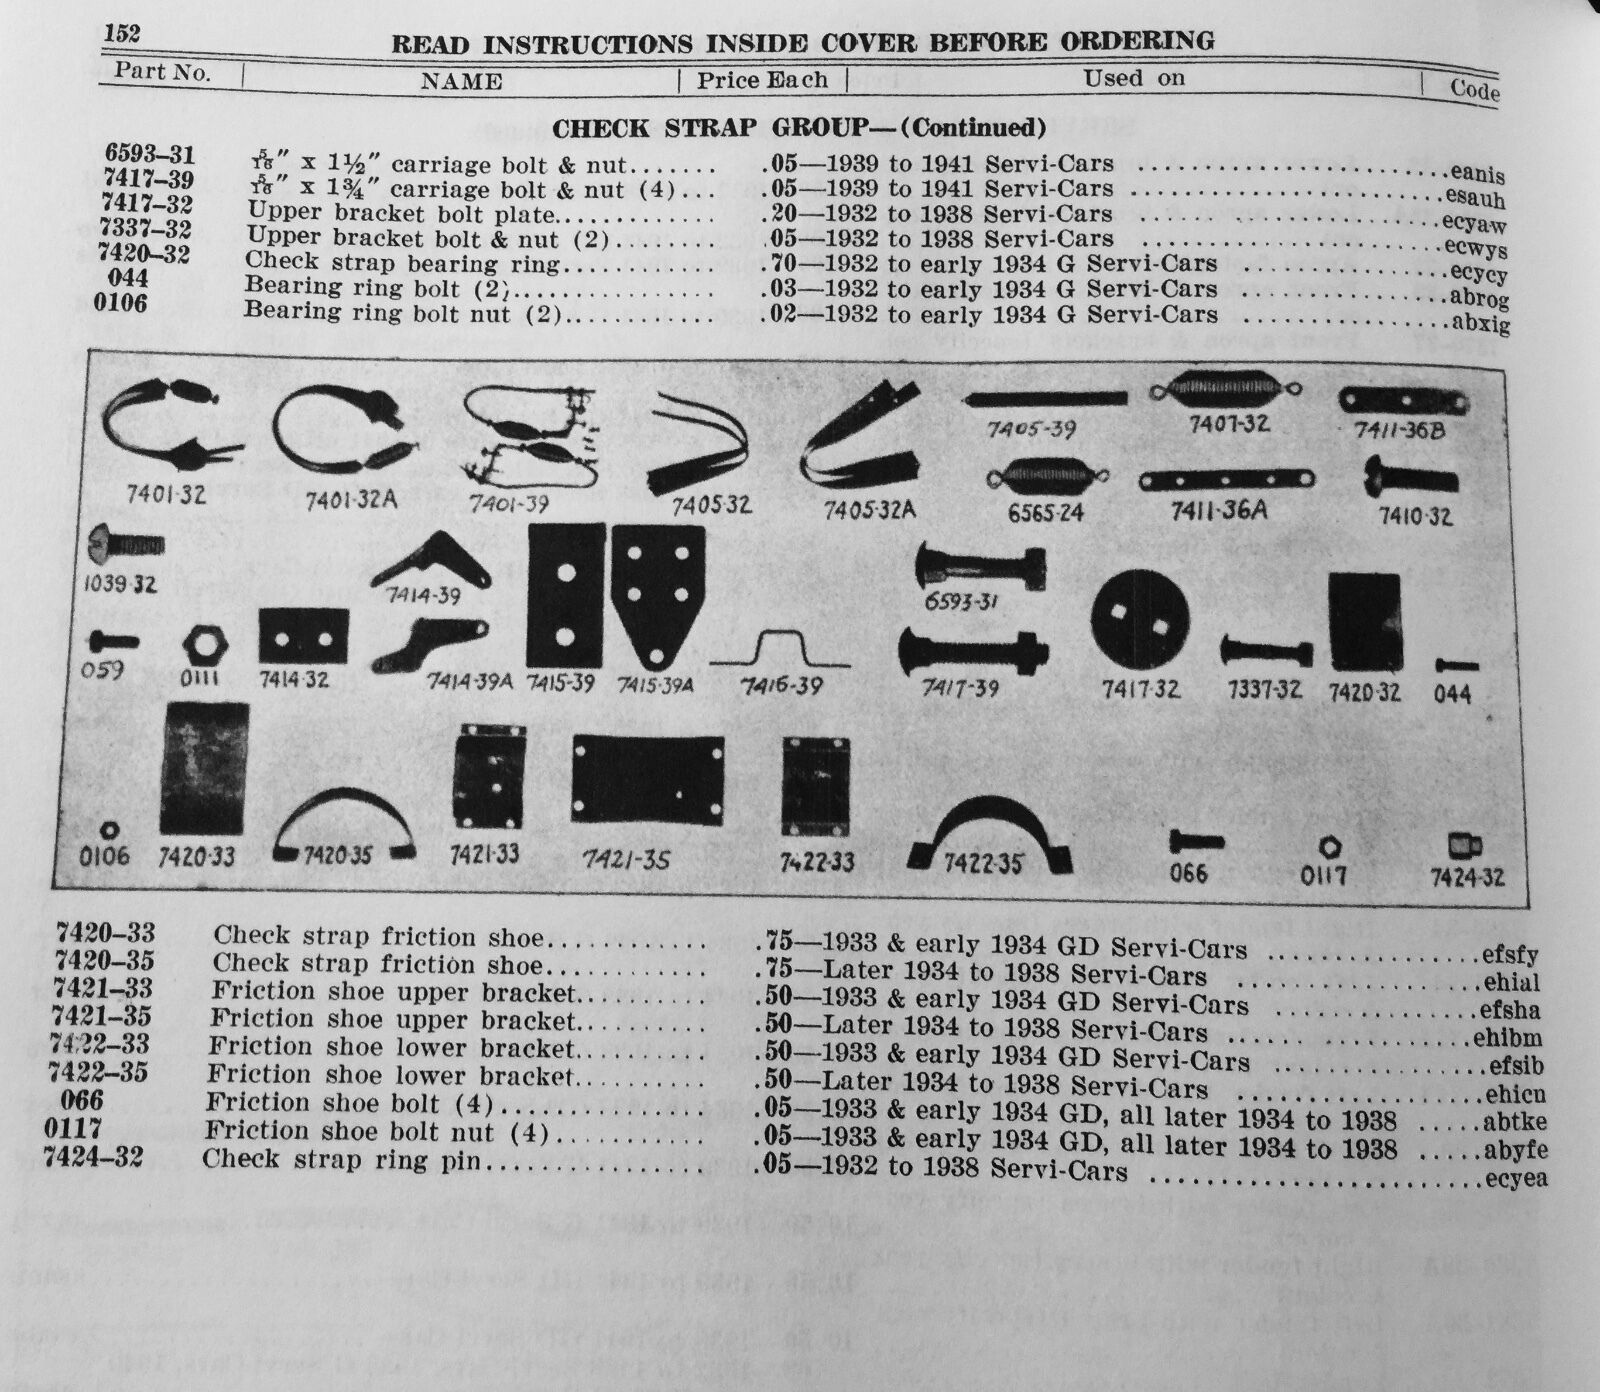 Harley Evo Parts Diagram - Wiring Diagrams on